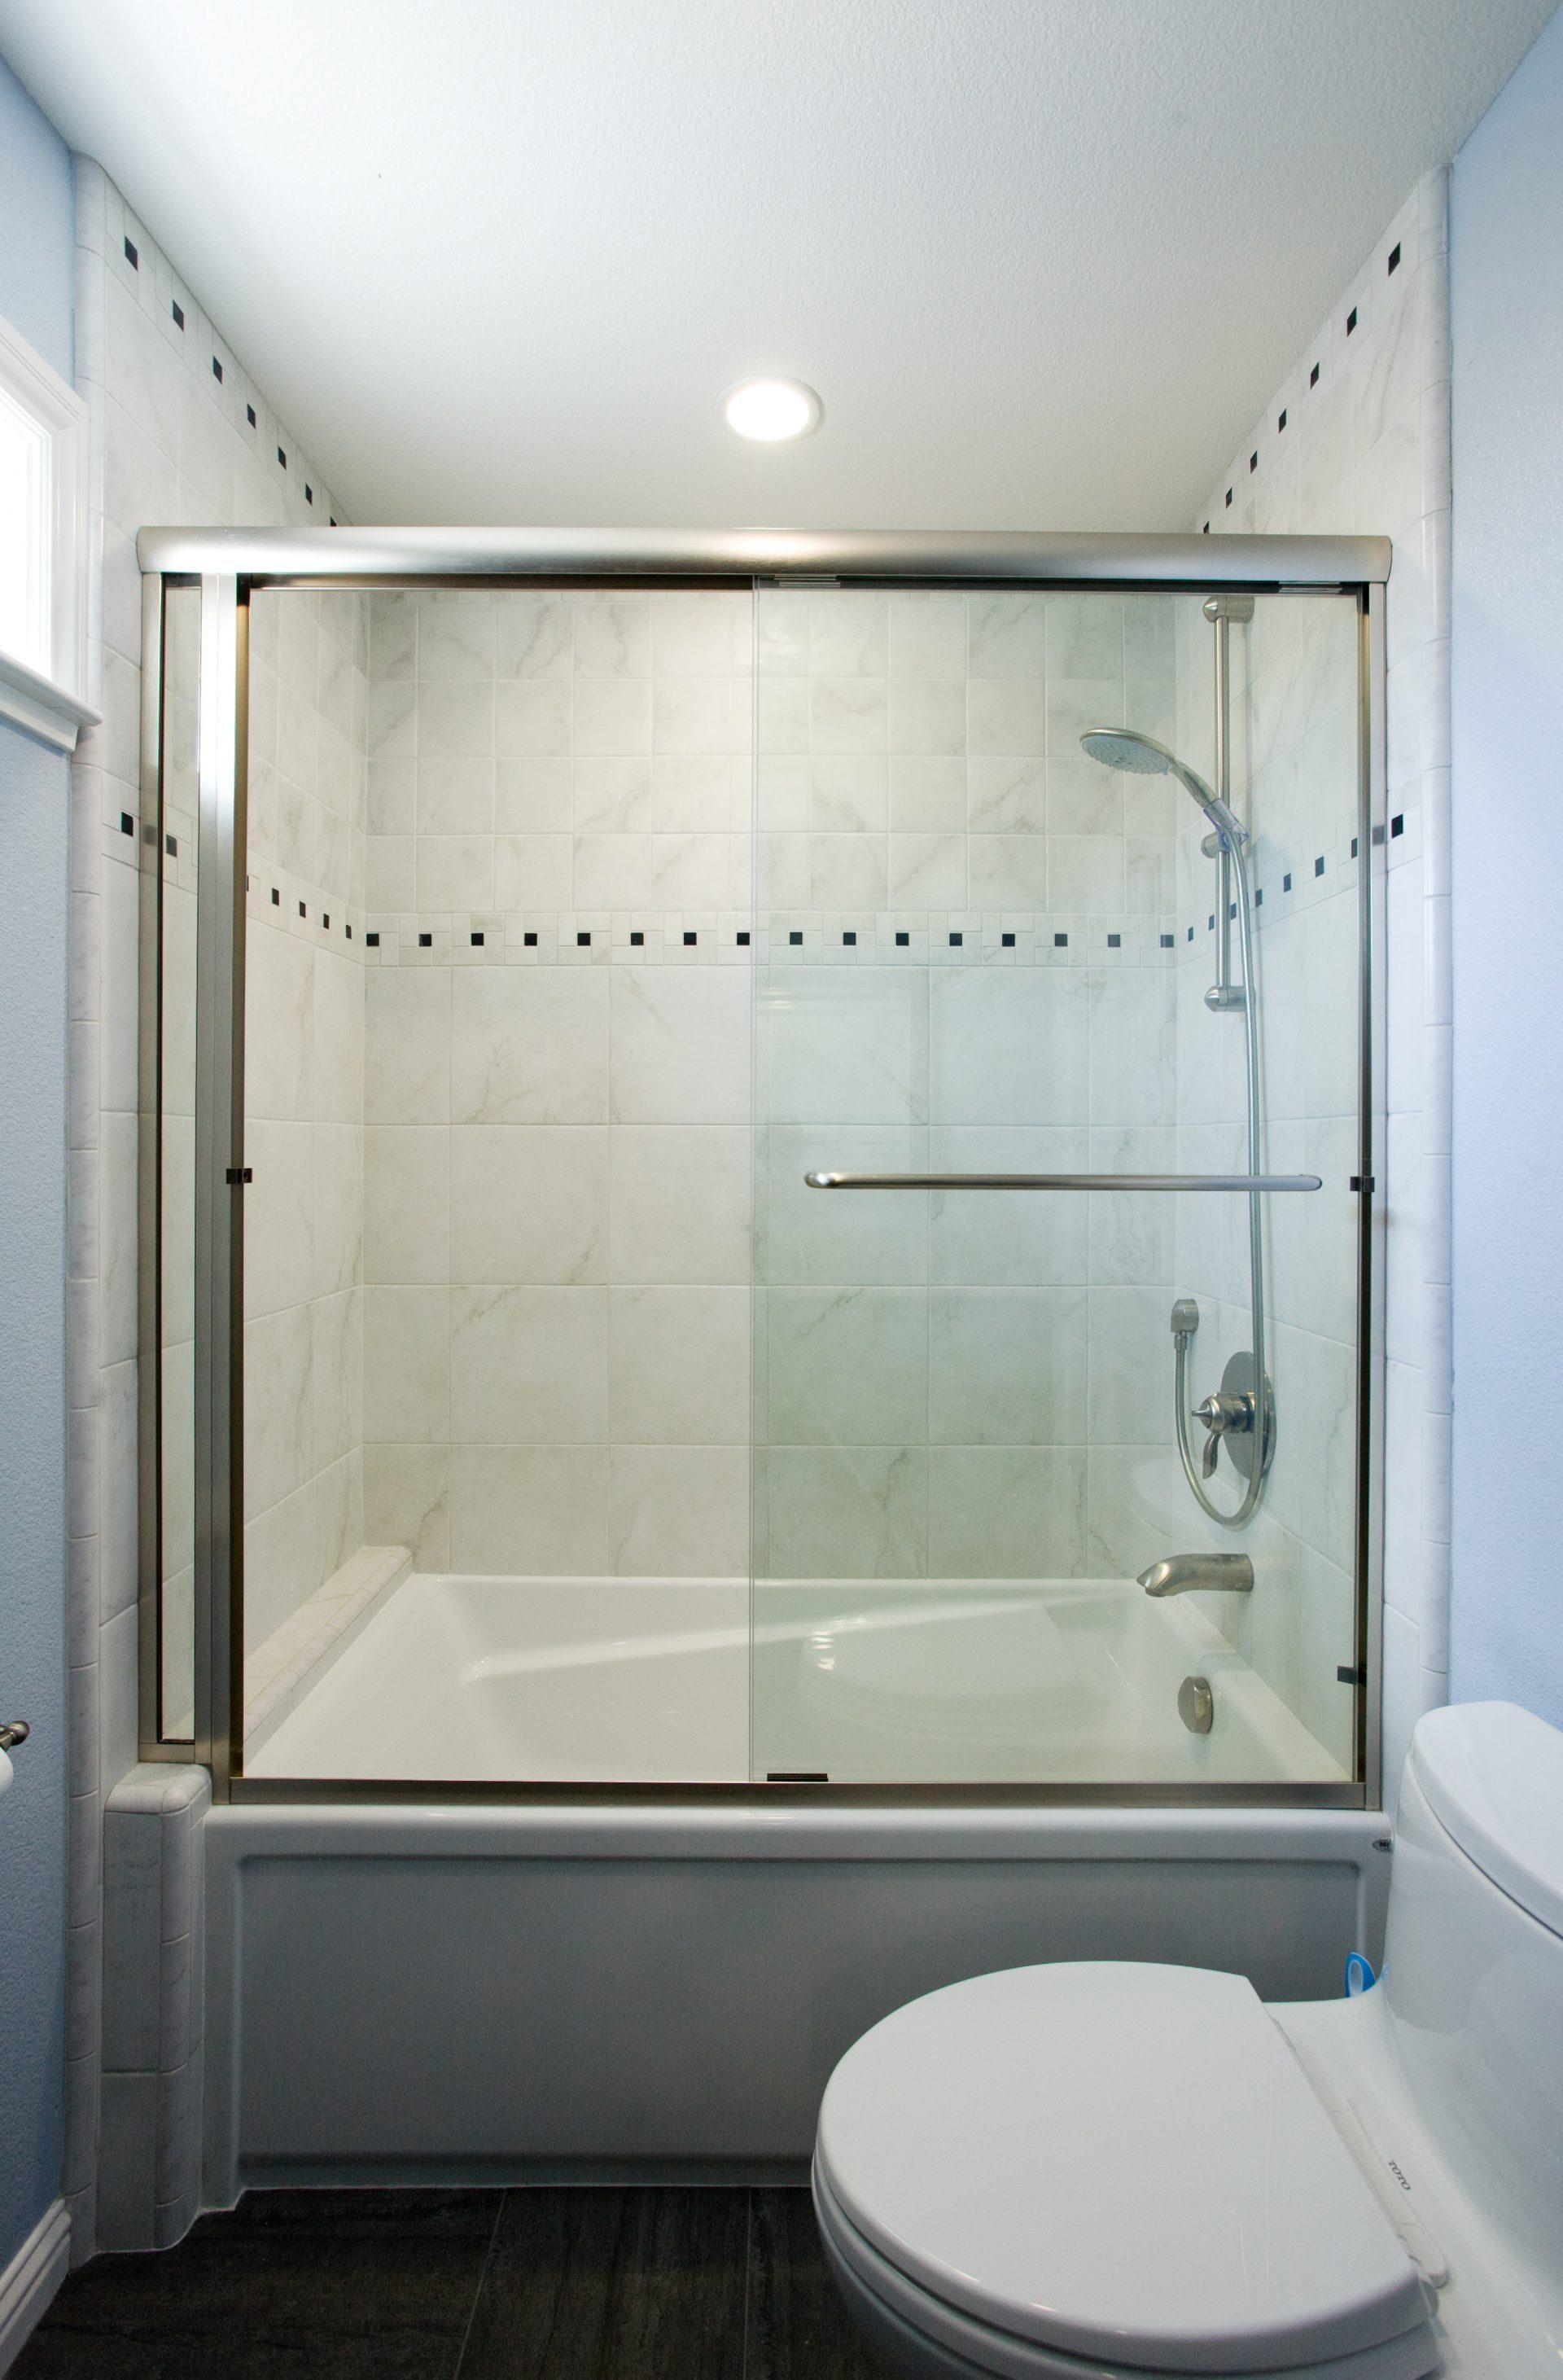 htm estate jose plumbing real san fernando bath a half e st